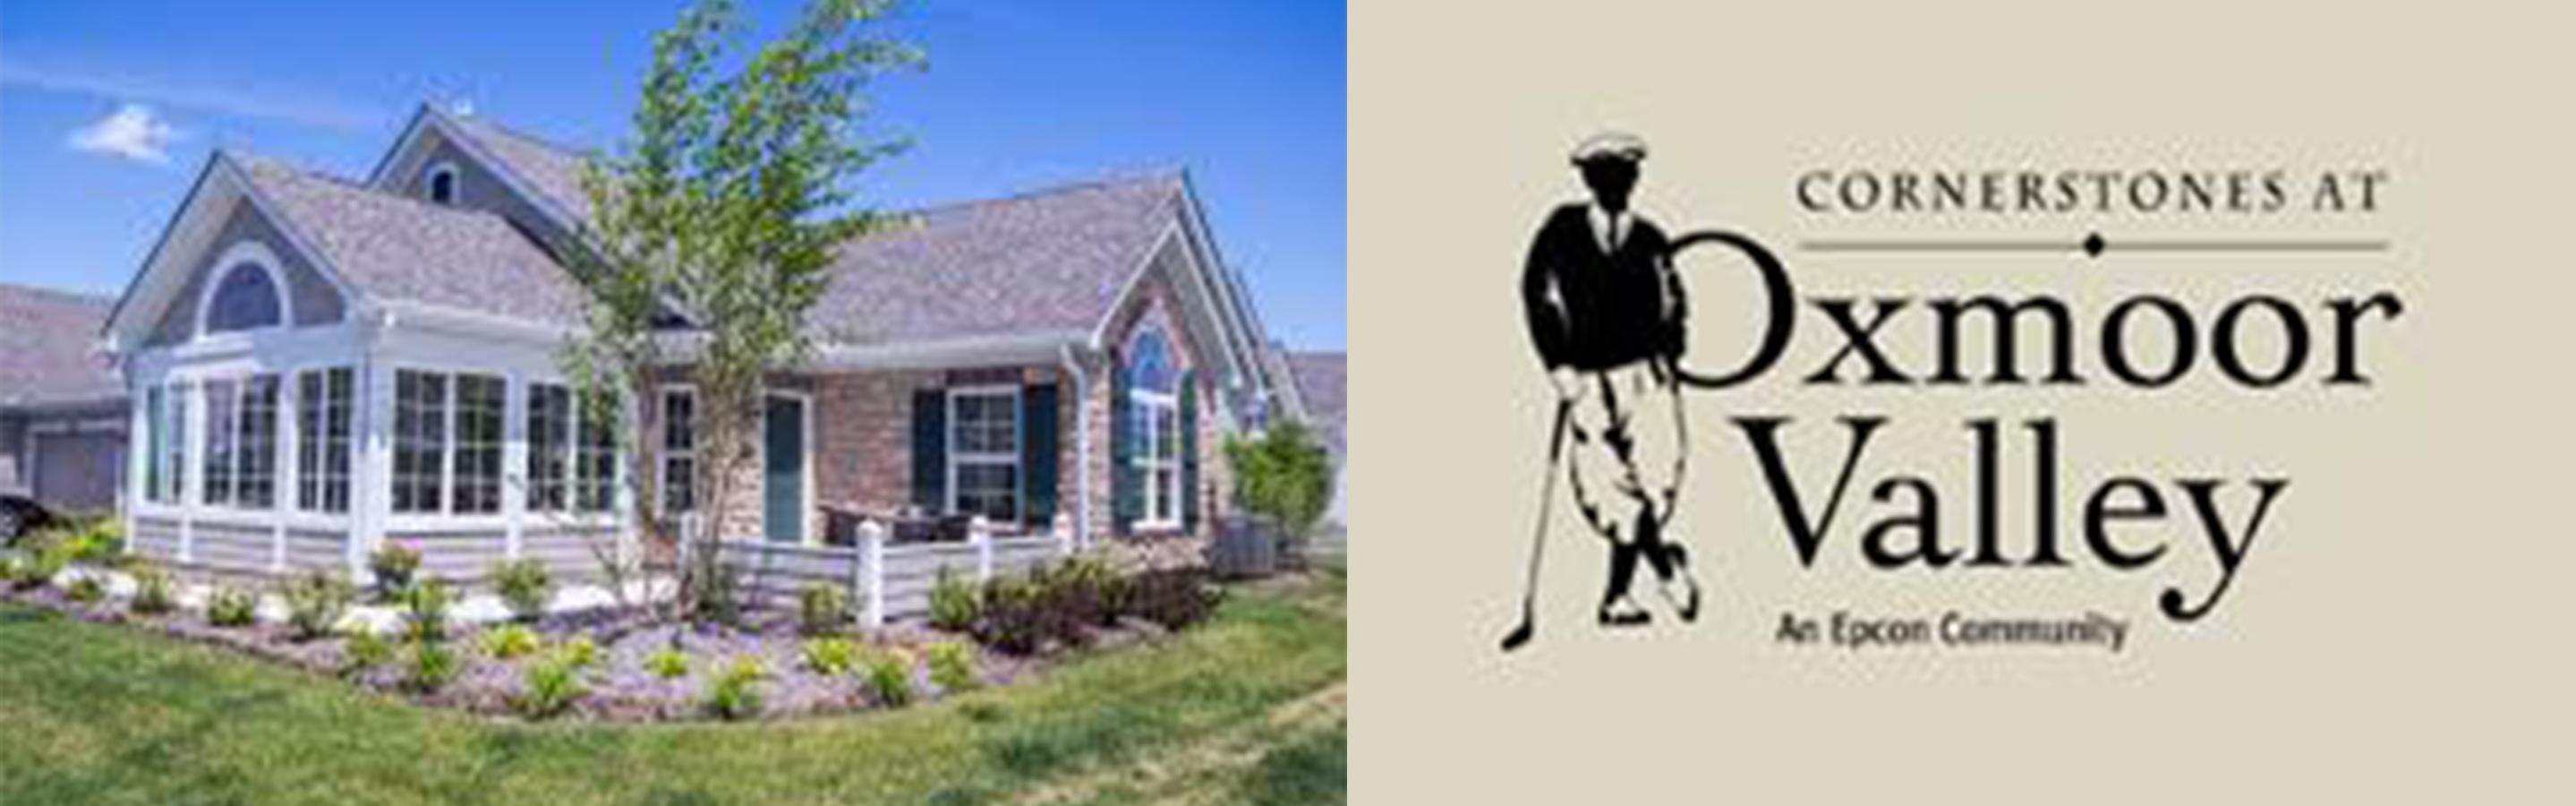 Cornerstones at Oxmoor Valley Homes for Sale